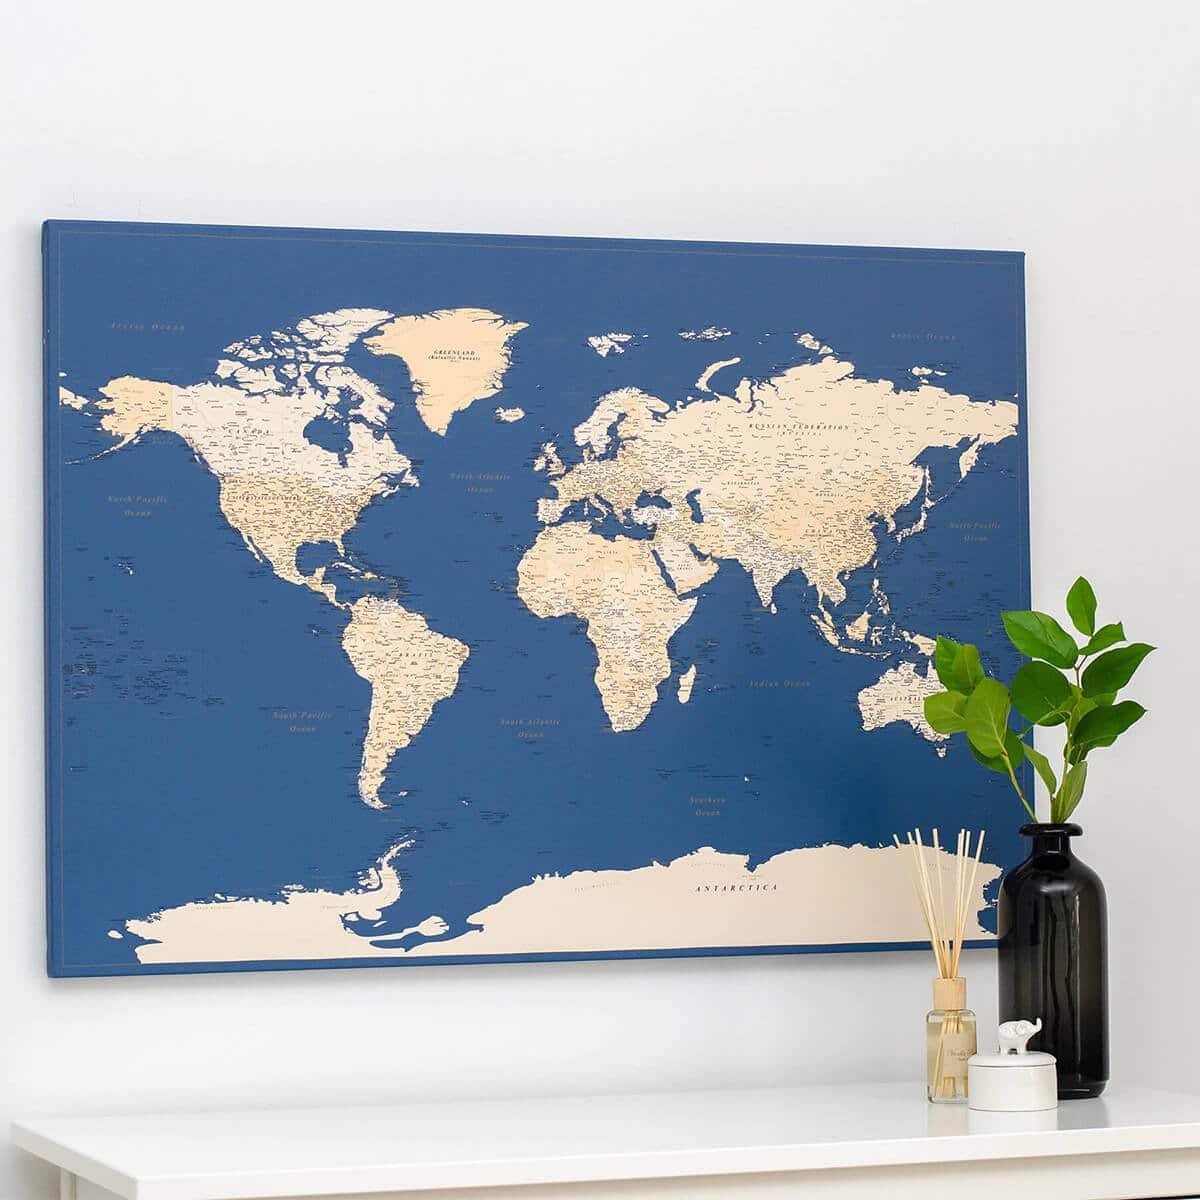 push-pin-world-map-dark-blue-canvas-tripmapworld